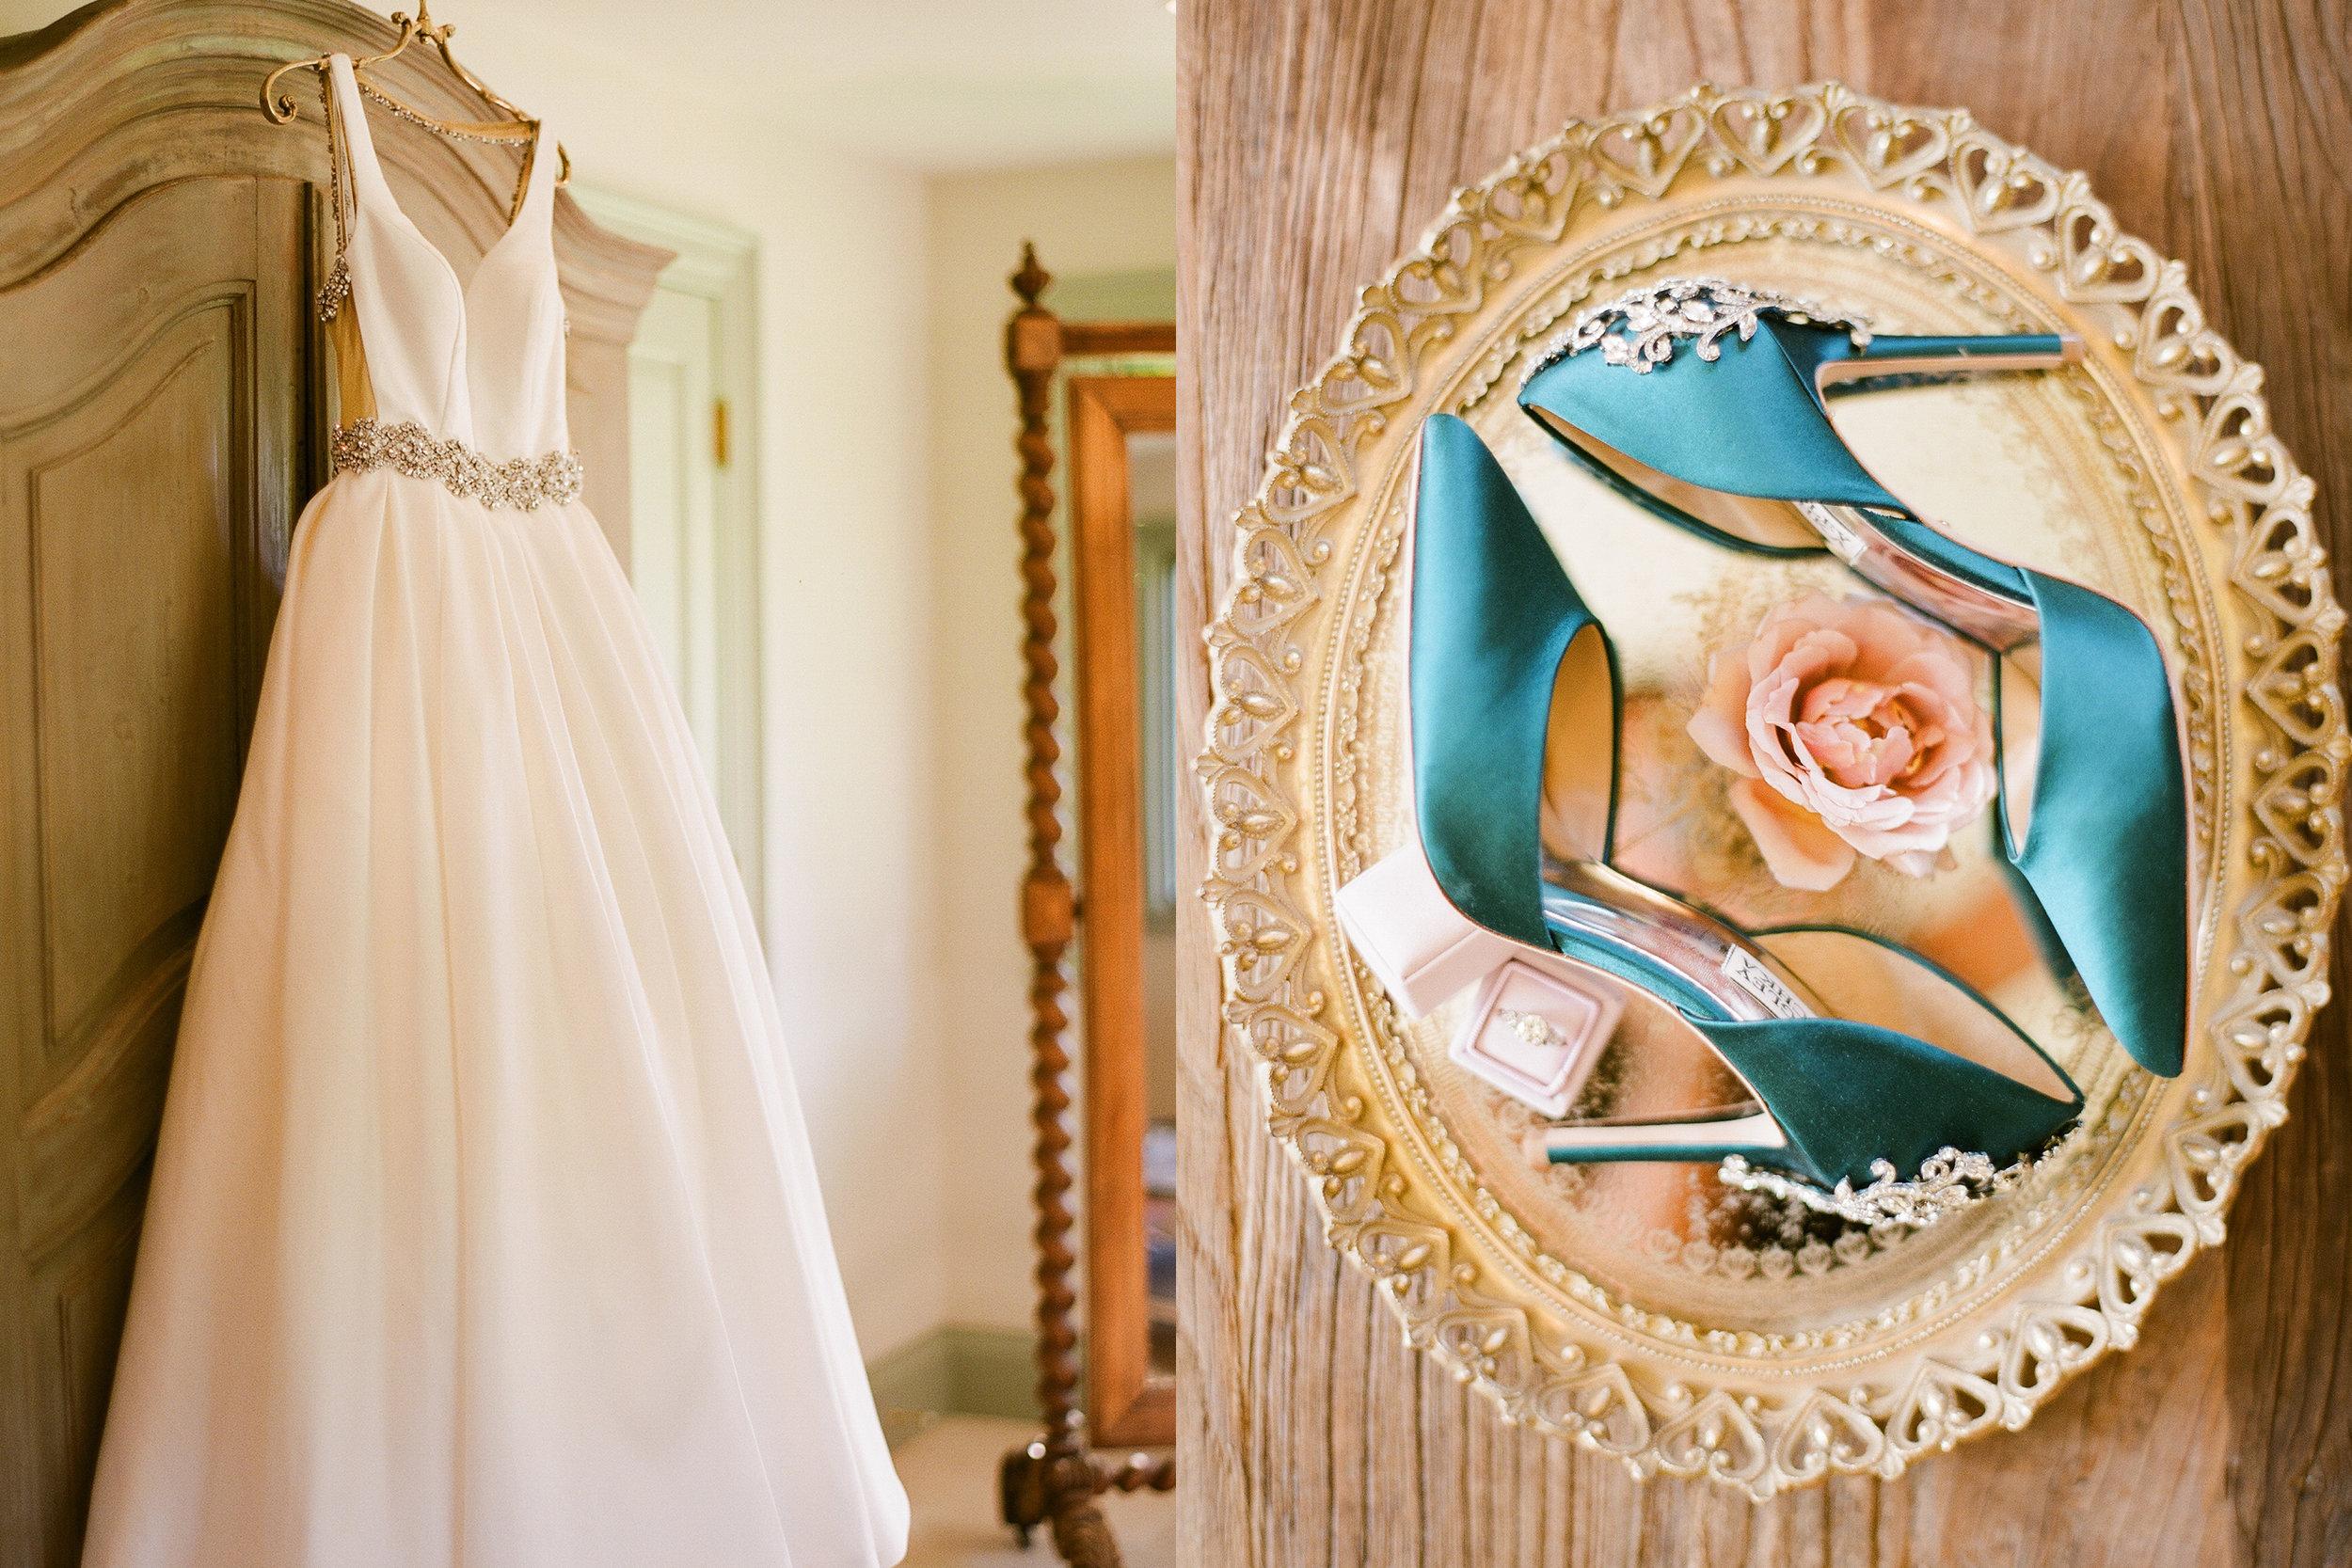 santa-barbara-elopement-elope-wedding-planner-planning-coordinator-day-of-intimate-event-design-kestrel-park-santa-ynez-english-country-estate-garden-castle (2).jpg